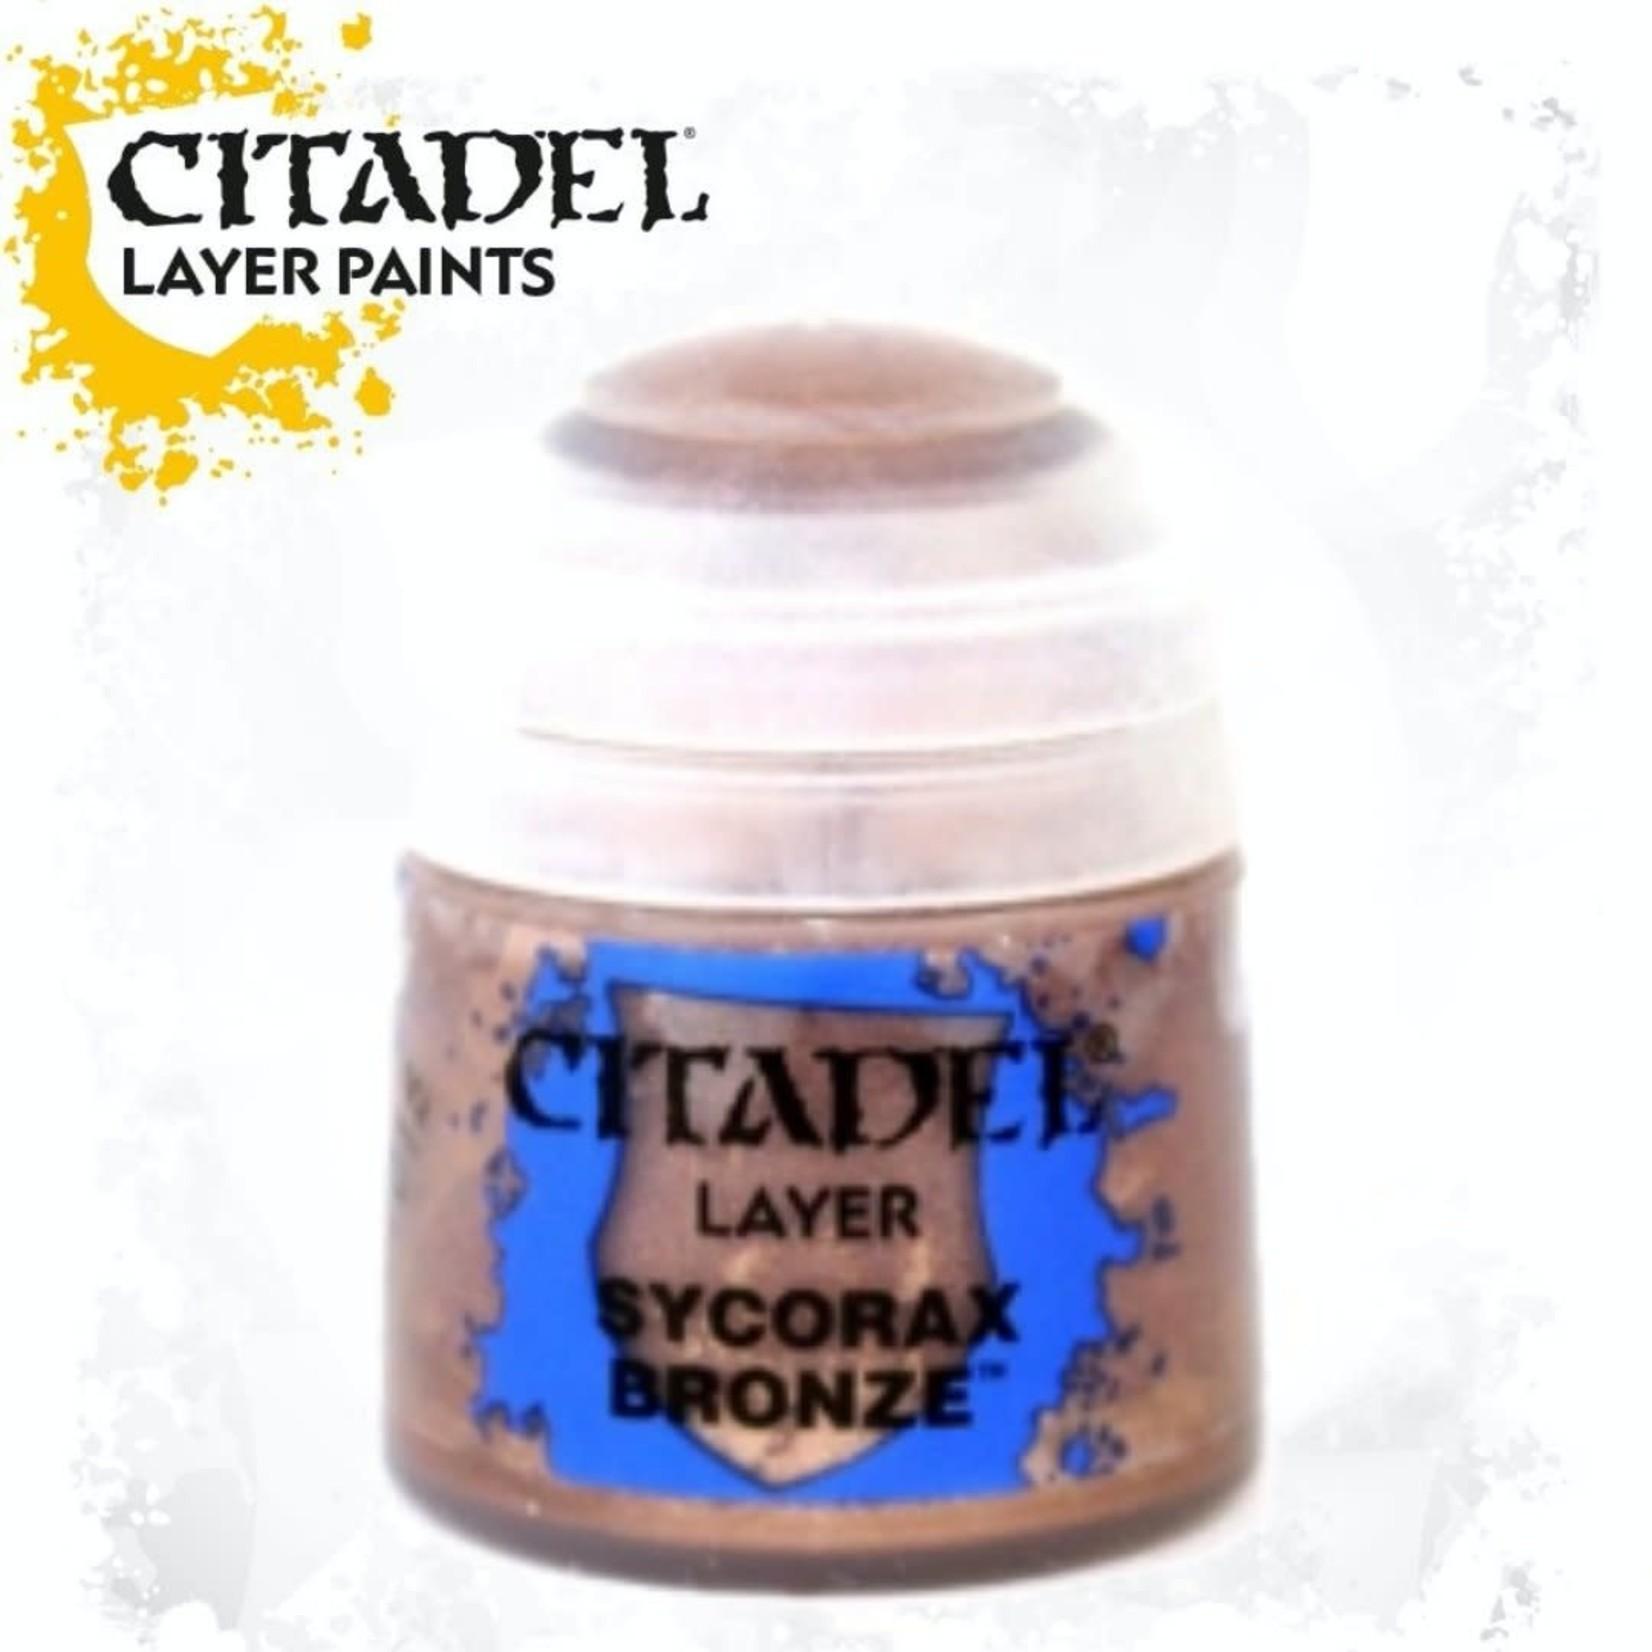 Citadel Citadel Paint - Layer: Sycorax Bronze